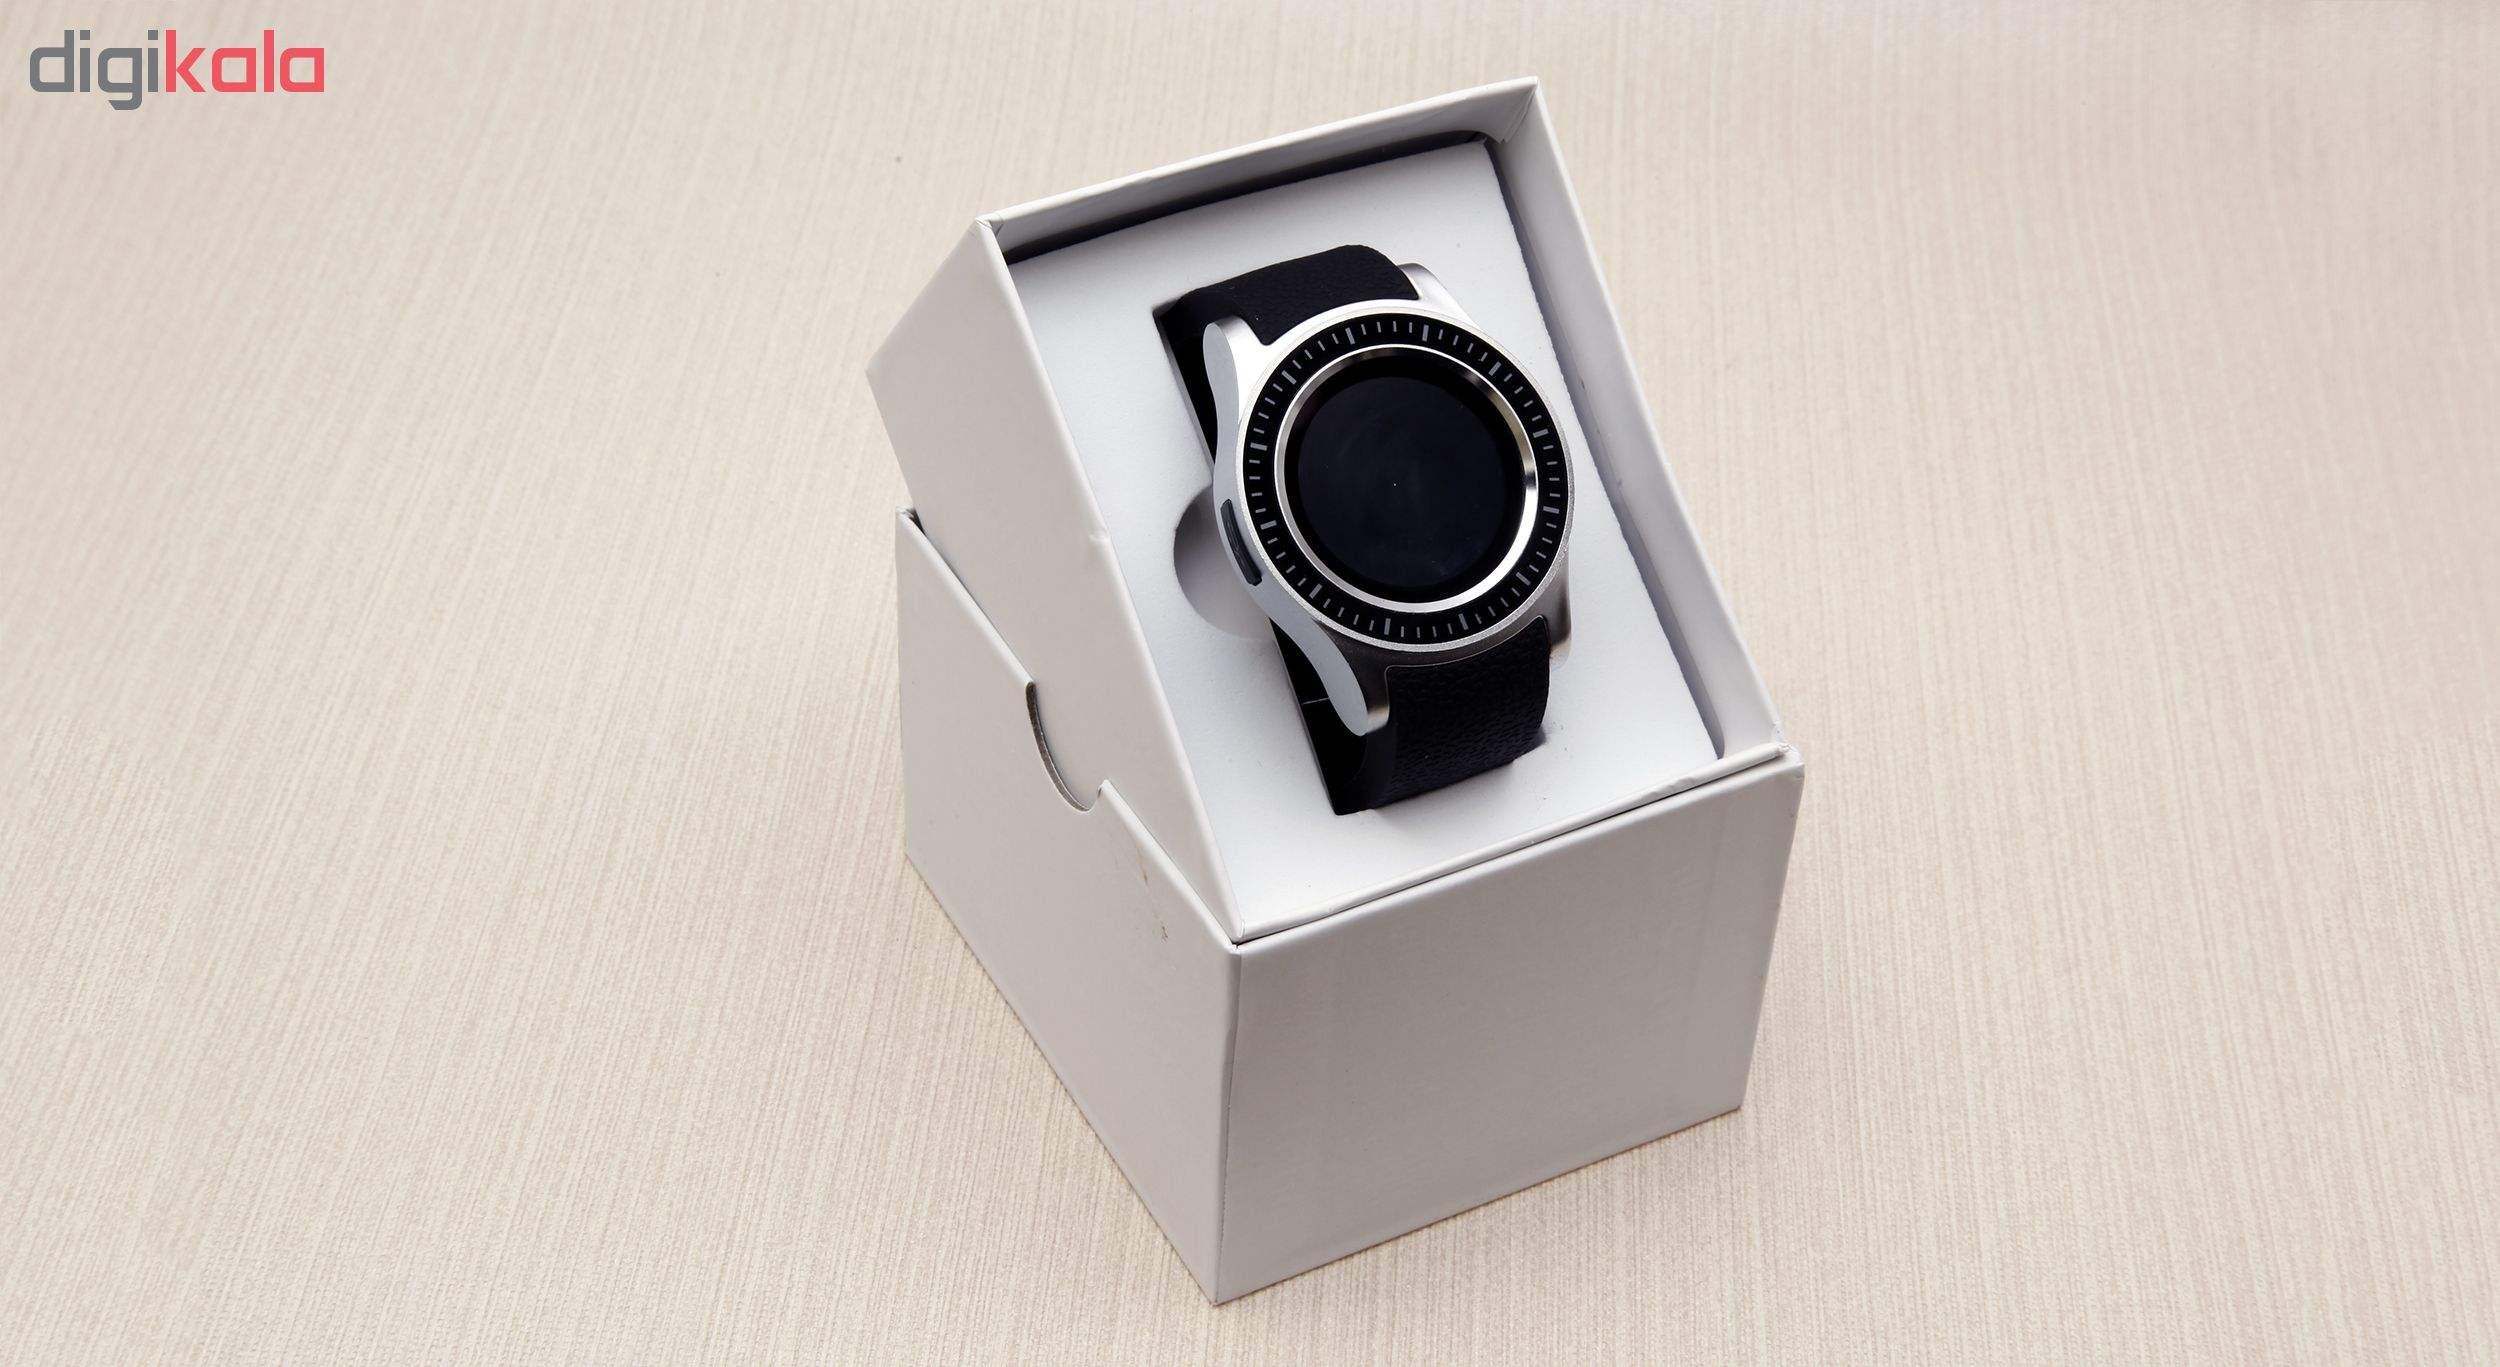 ساعت هوشمند جی تب مدل S1 main 1 1